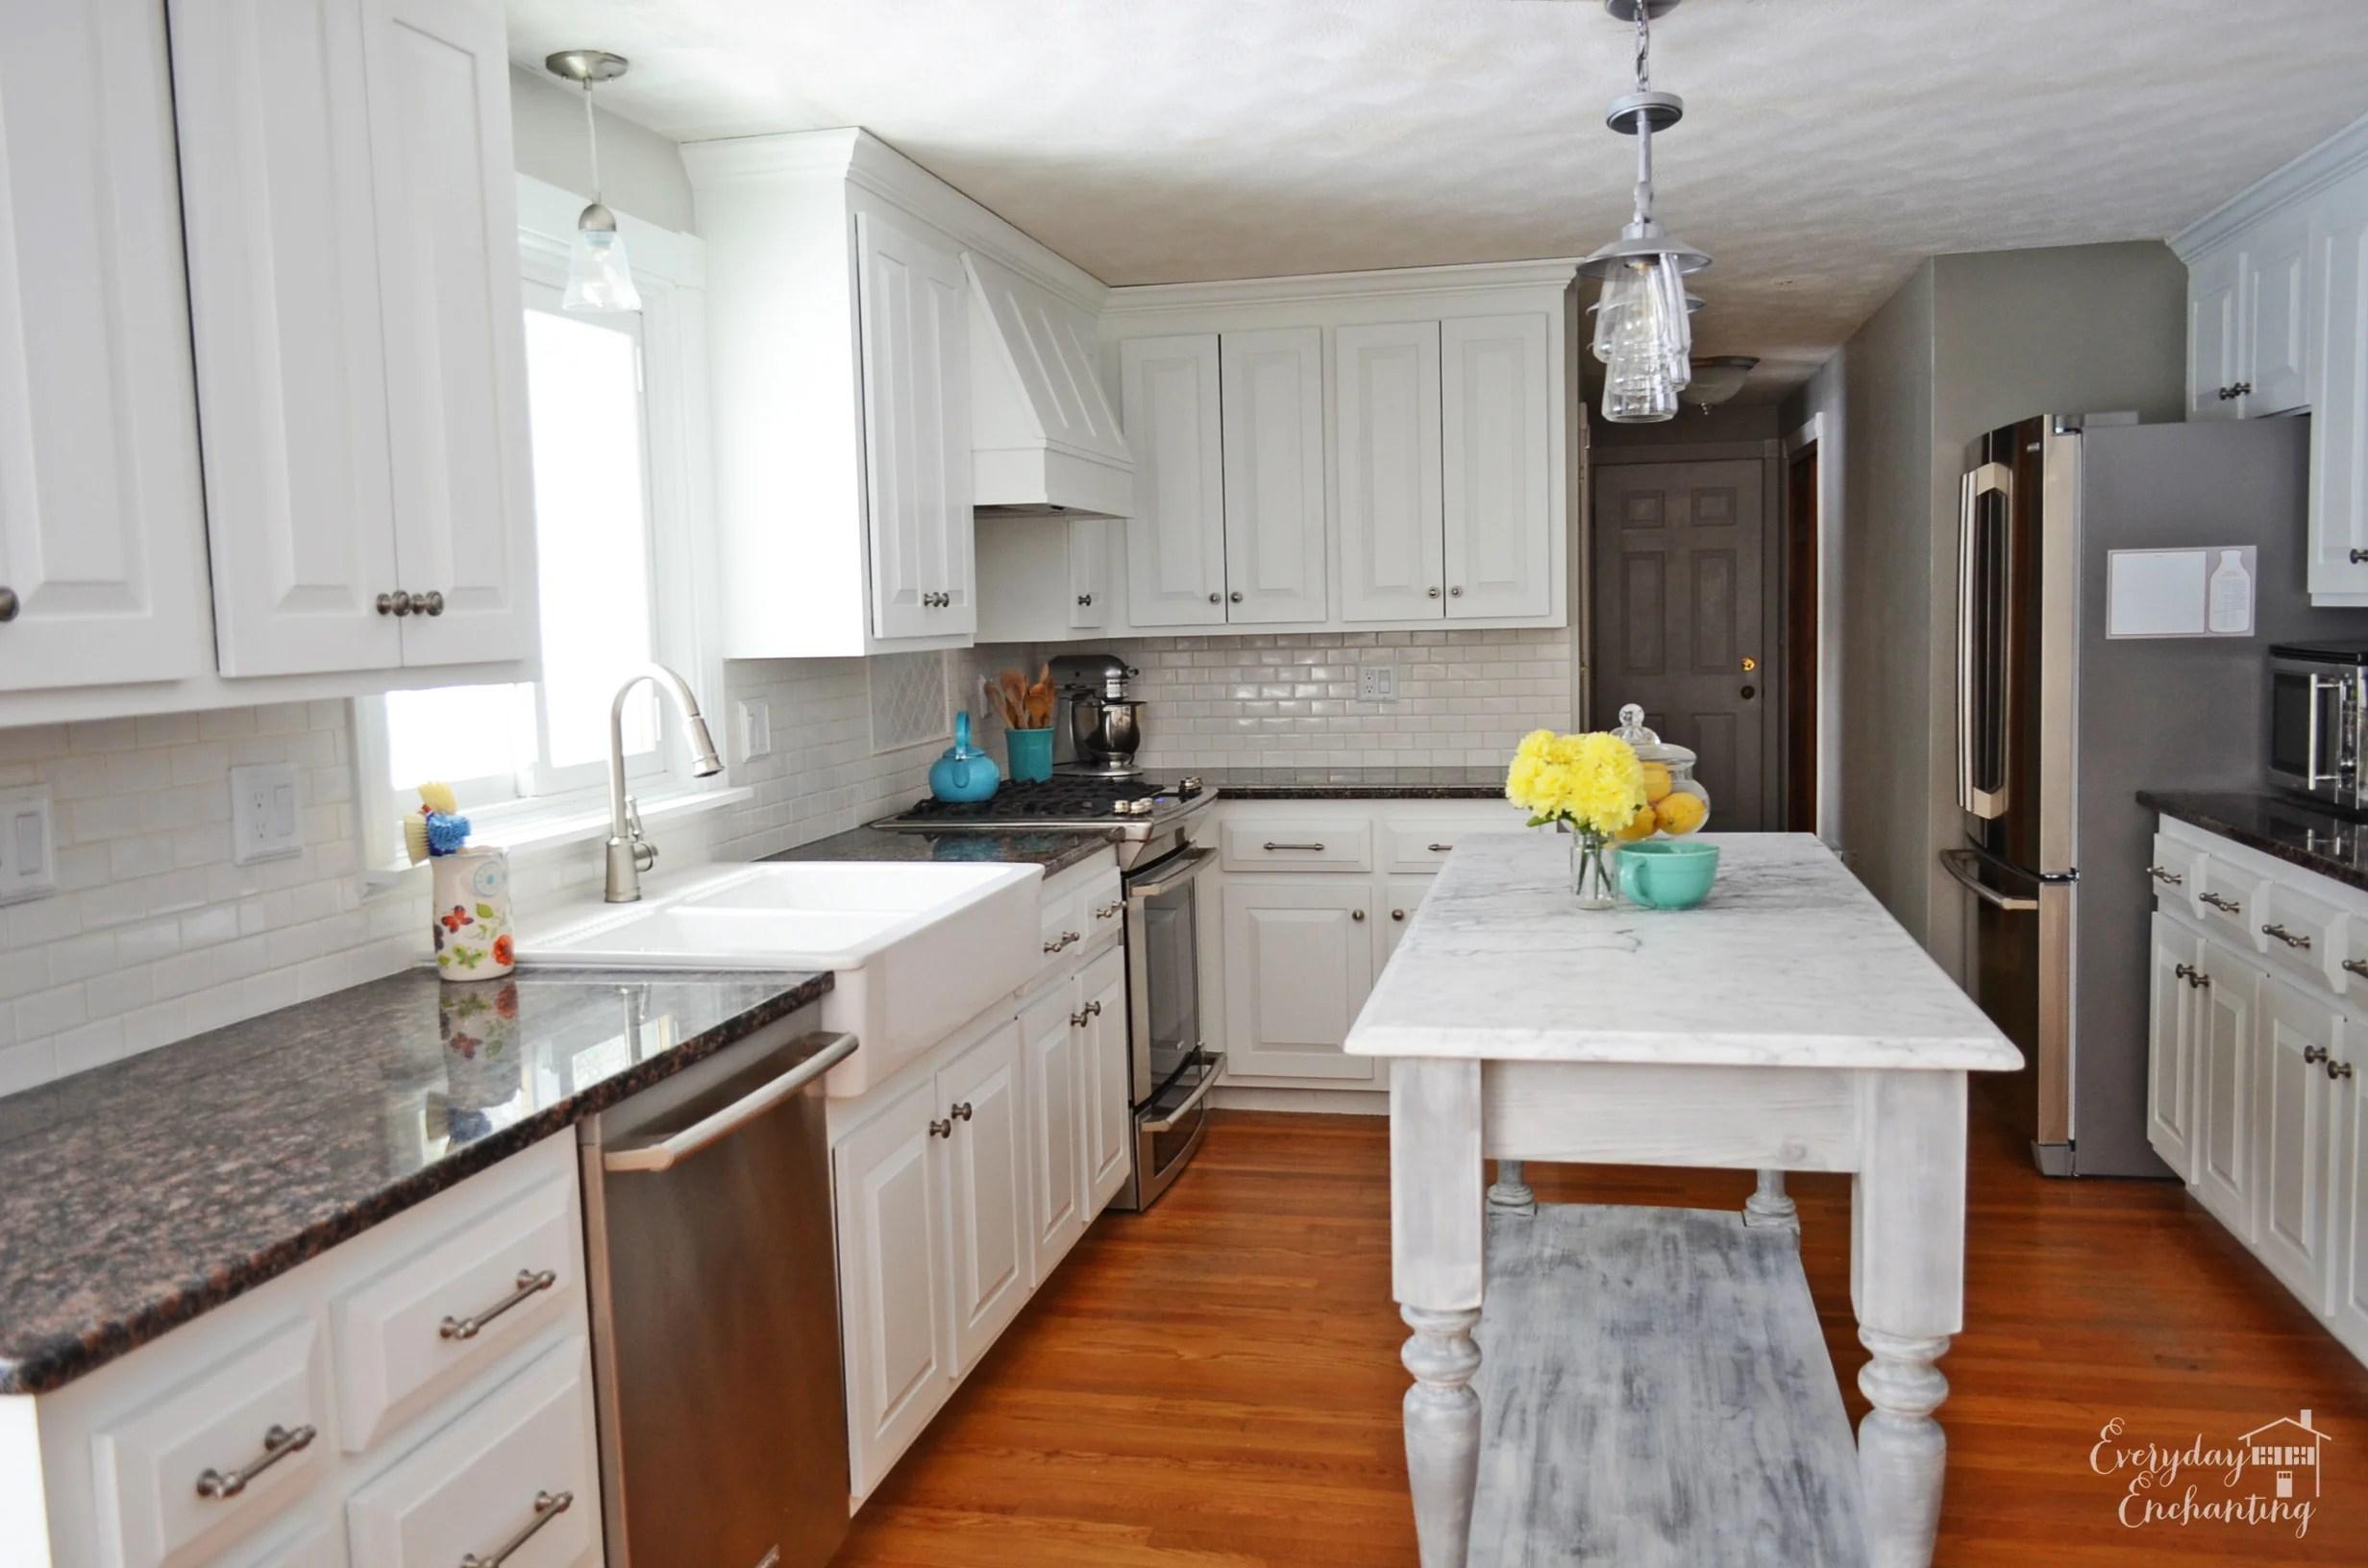 Bon Marble Kitchen Island In White Kitchen, Everyday Enchanting On Remodelaholic